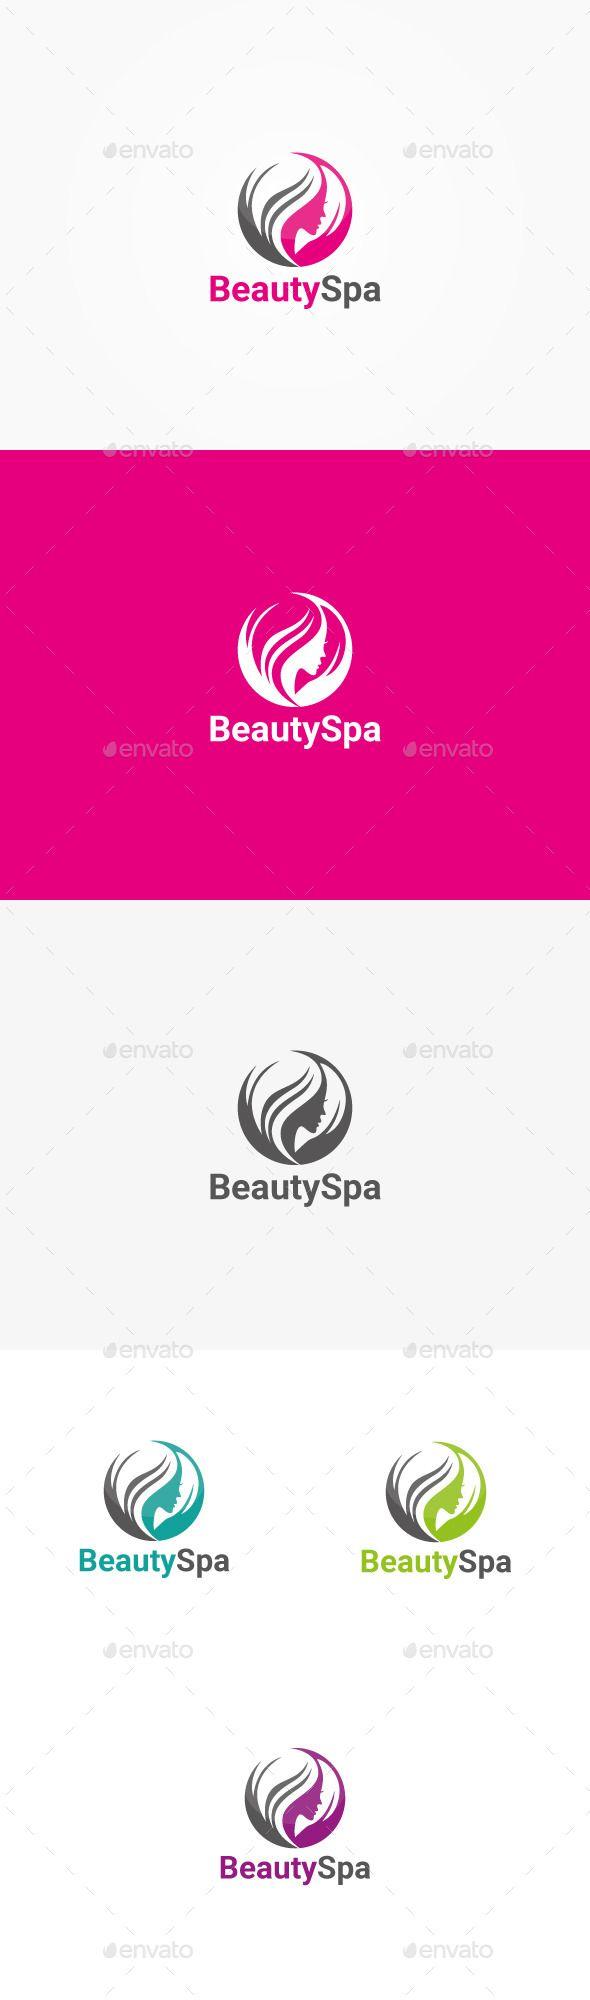 Beauty & Hair Salon Logo Template Vector EPS, AI. Download here: http://graphicriver.net/item/beauty-hair-salon-logo/10792747?ref=ksioks